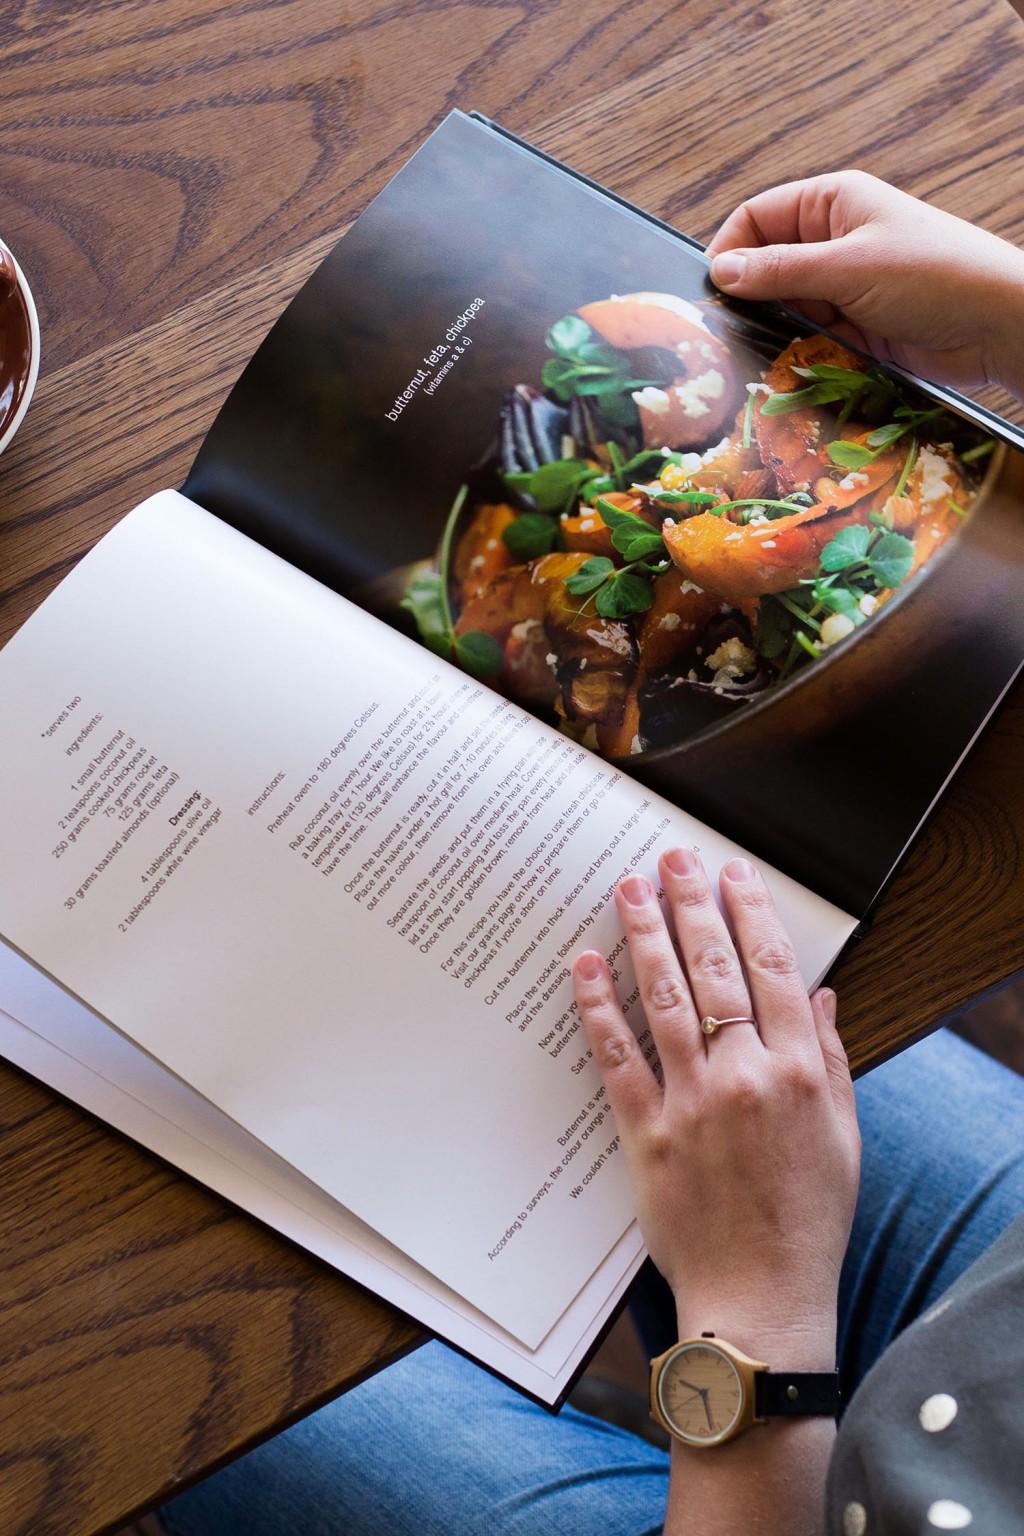 Melissa Delport - Orms Maker Series - Personalise Recipe Photo Book